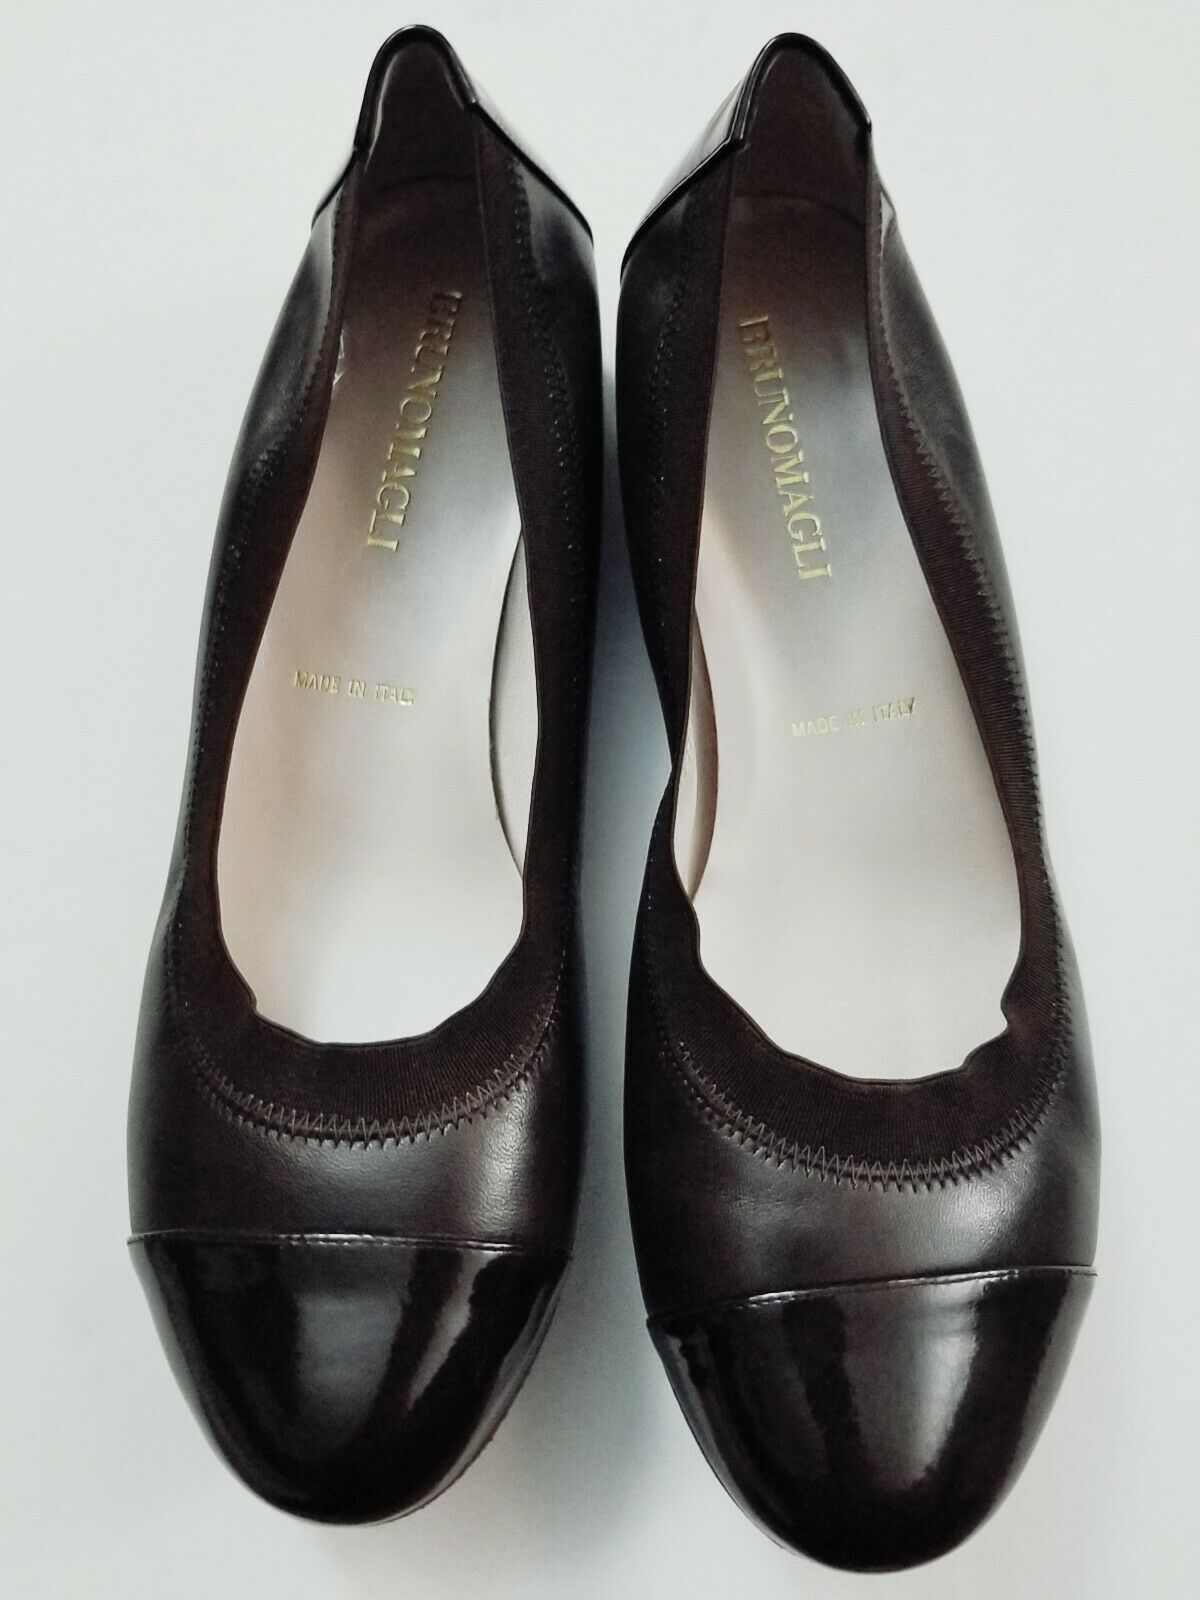 BRUNO MAGLI chaussures femme ballerines marron noir cuir verni SZ 37.5 US 7  349